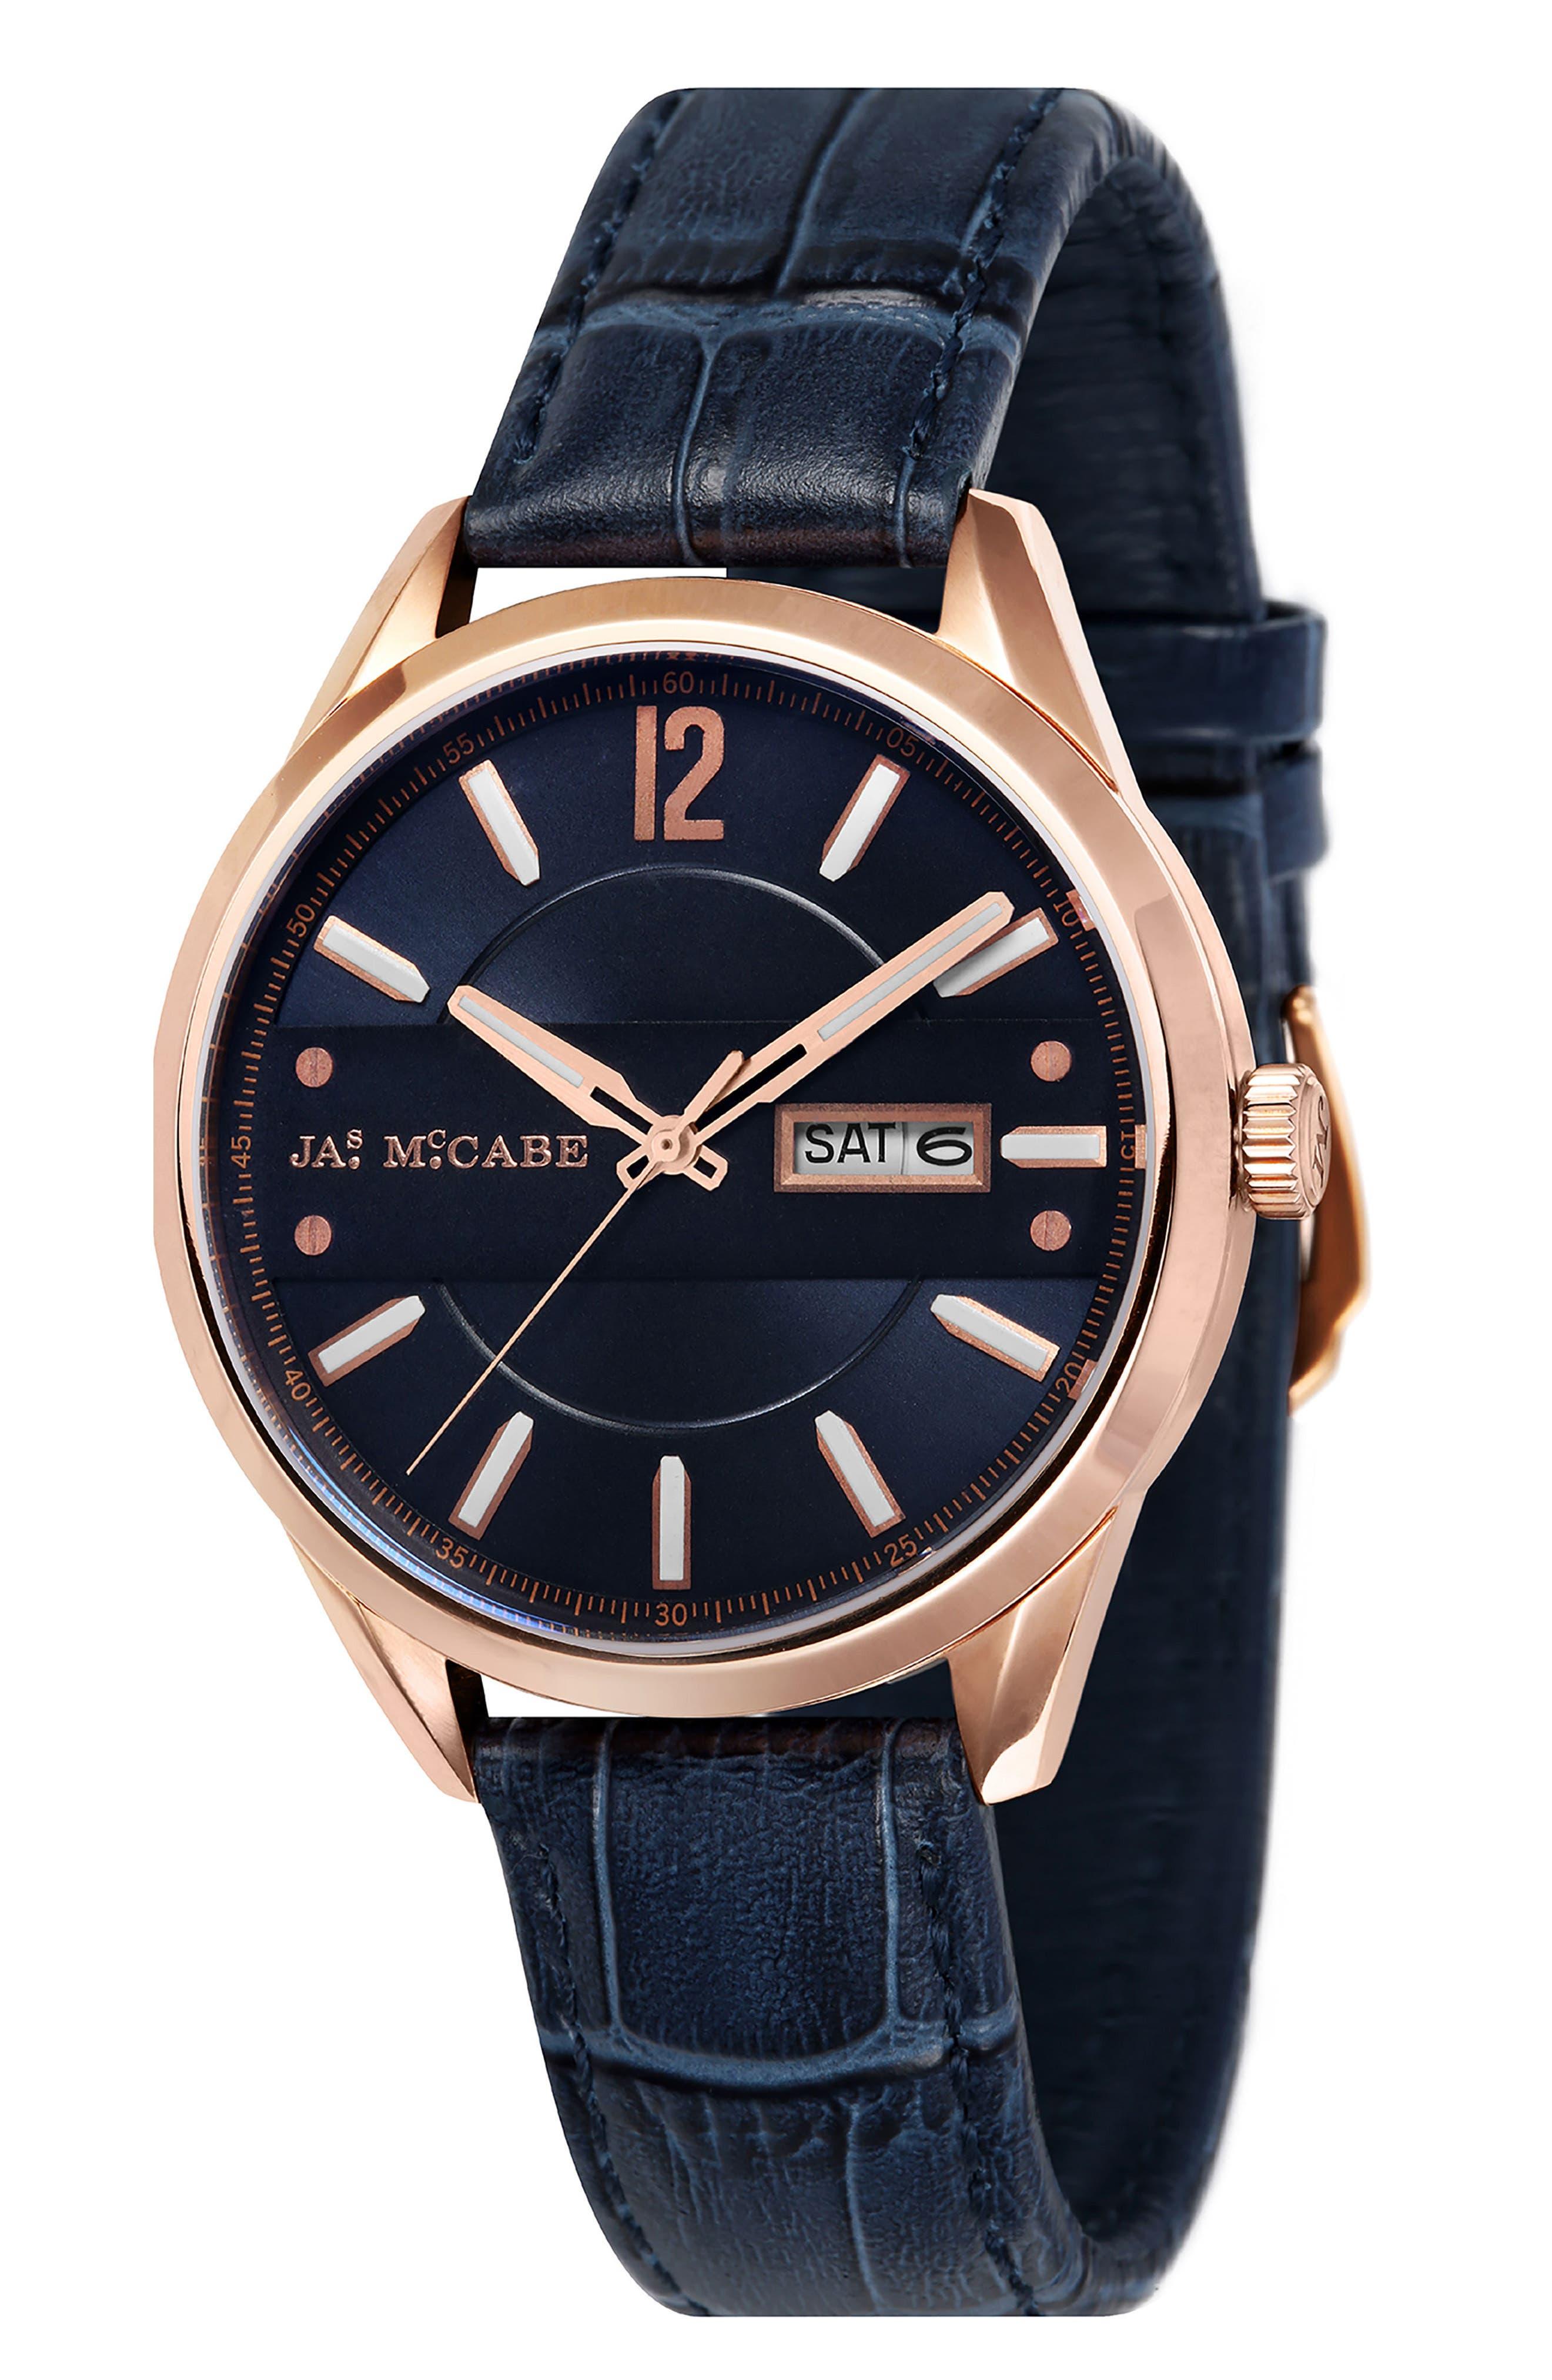 James McCabe New Belfast Slim Leather Strap Watch, 38mm